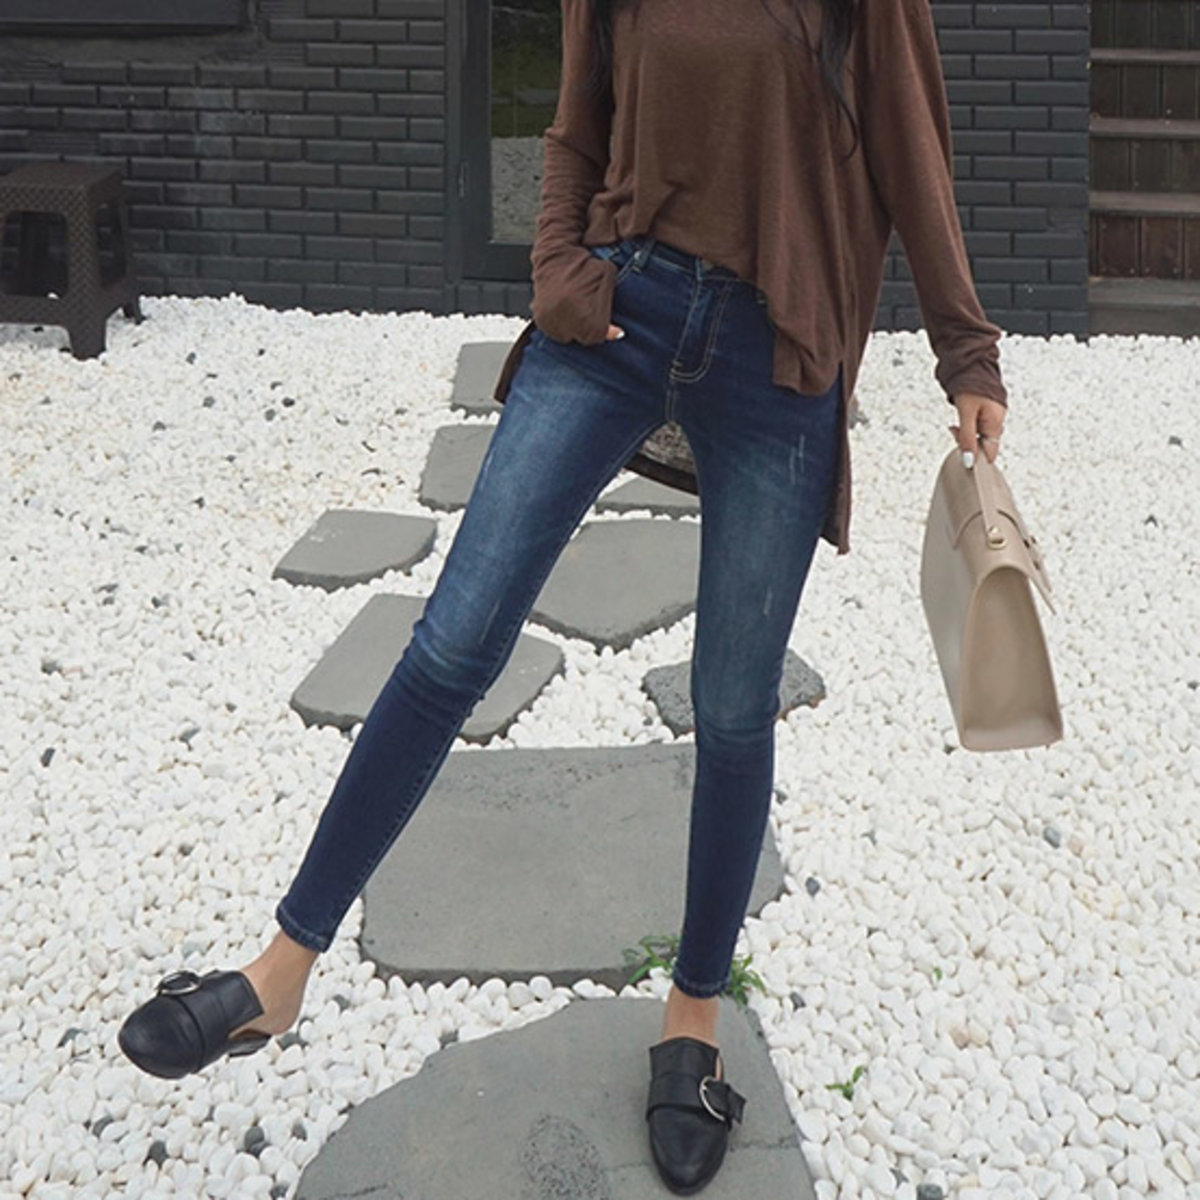 Na1017 Women'S Skinny Jeans